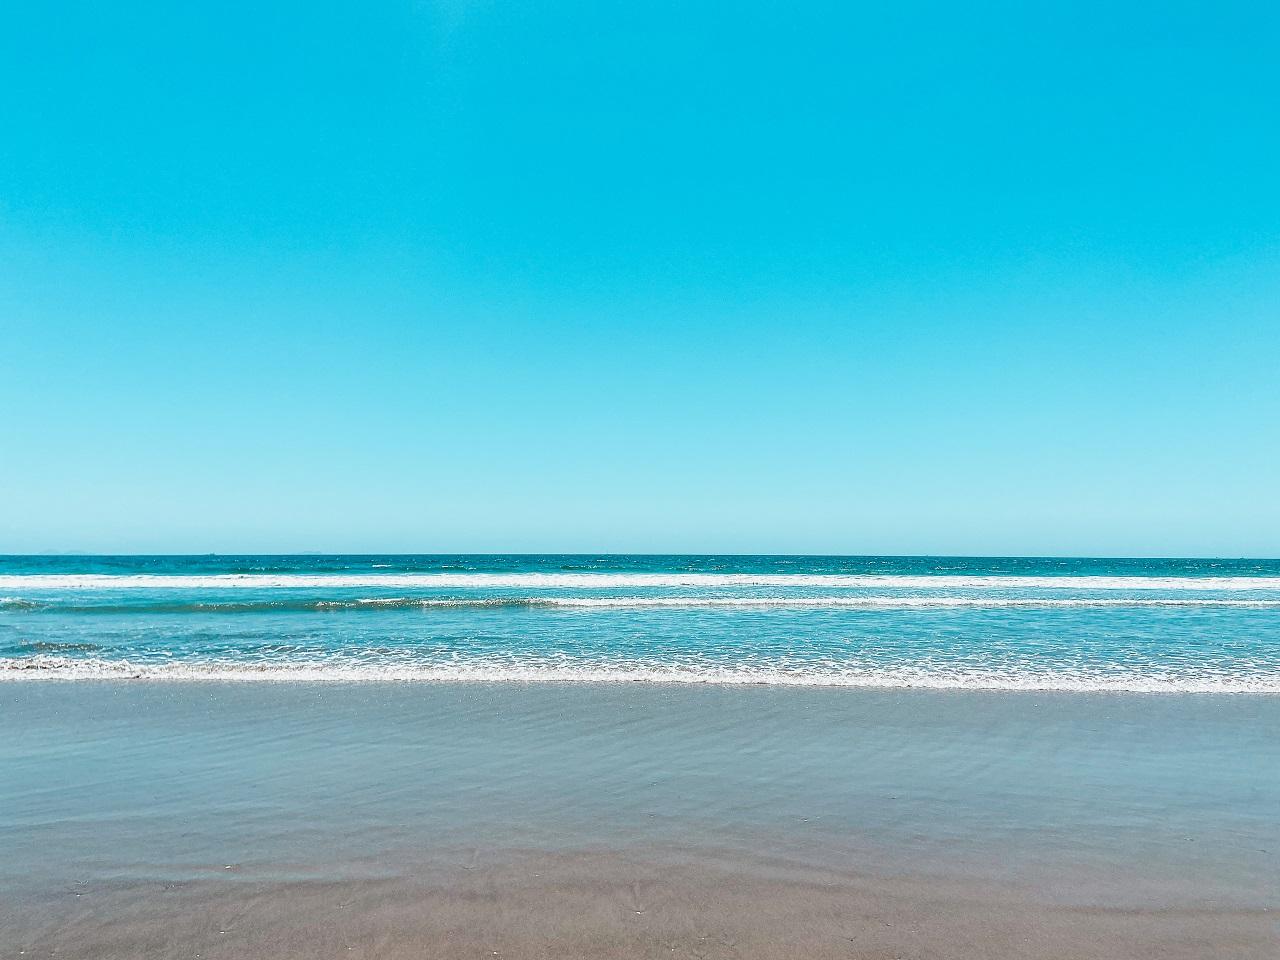 sandiego_coronado-beach